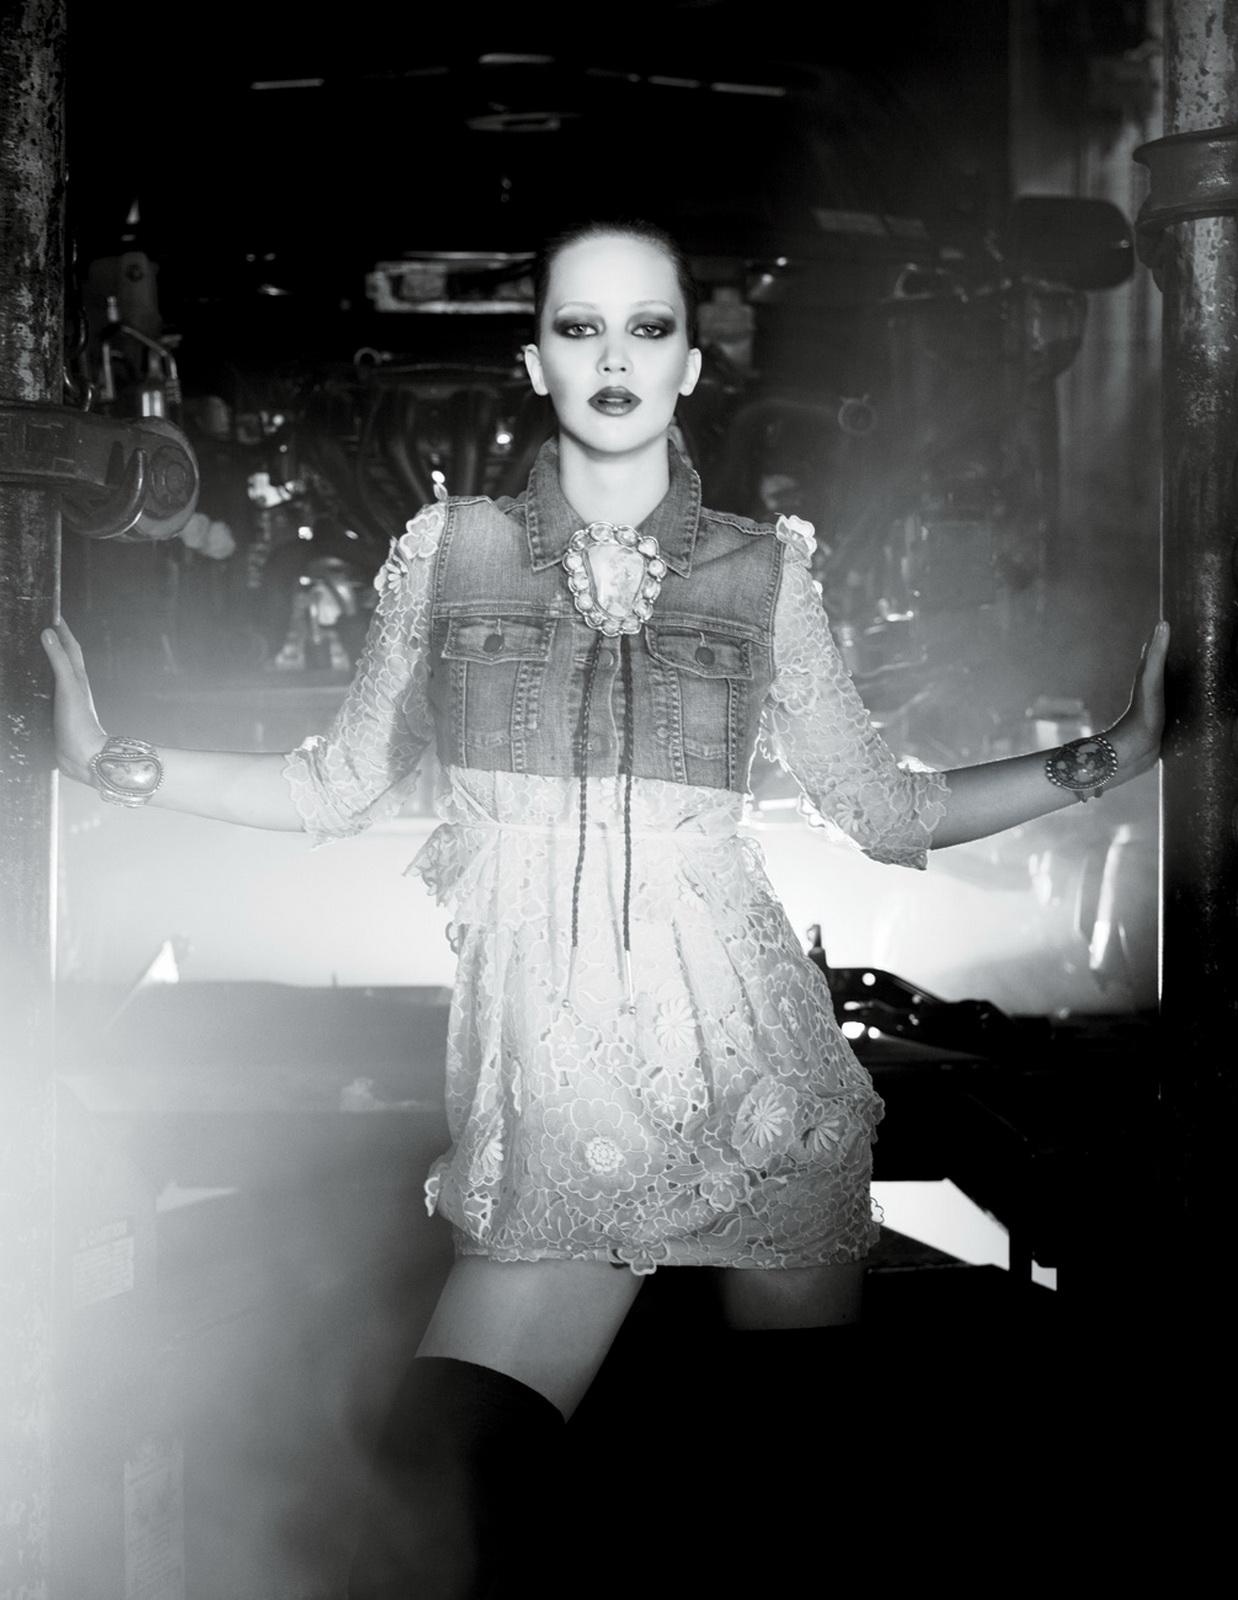 http://4.bp.blogspot.com/_Jgc-vQ1t70k/TOoLuwK3QfI/AAAAAAAAAcc/qQuHpbgI904/s1600/Jennifer_Lawrence_sexy_leggy_Interview_2.jpg